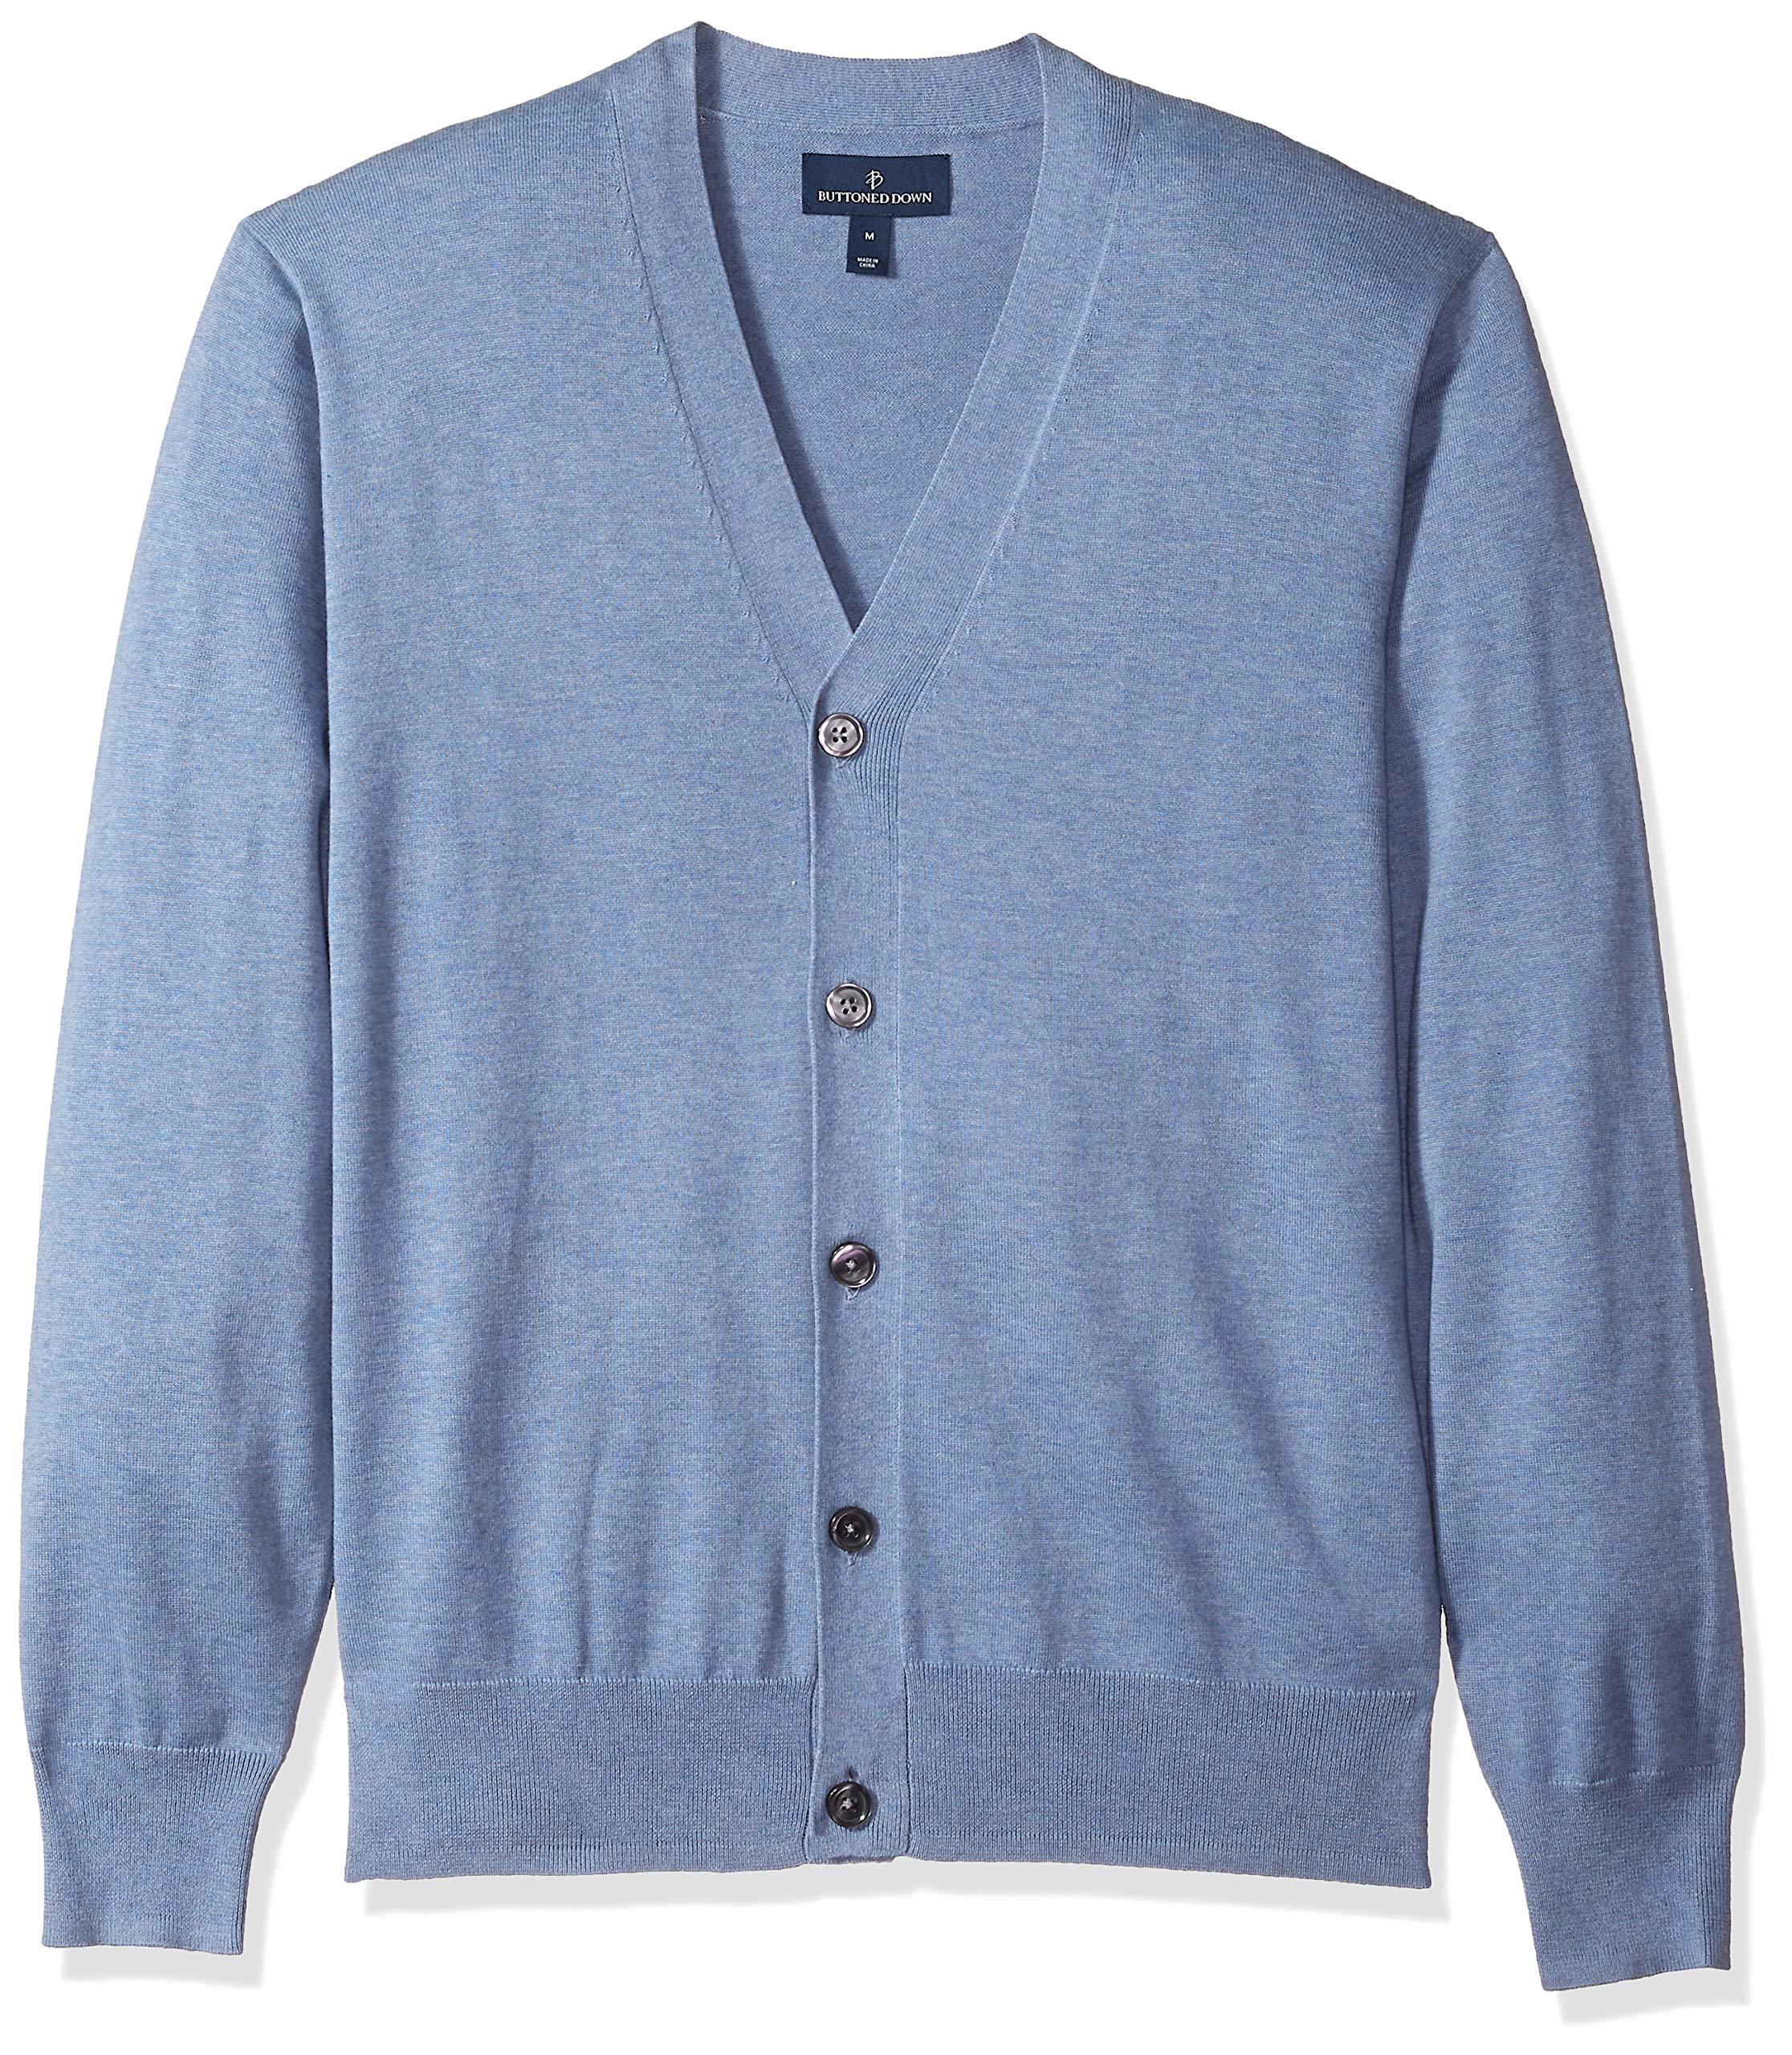 BUTTONED DOWN Men's Supima Cotton Lightweight Cardigan Sweater, blue, Medium